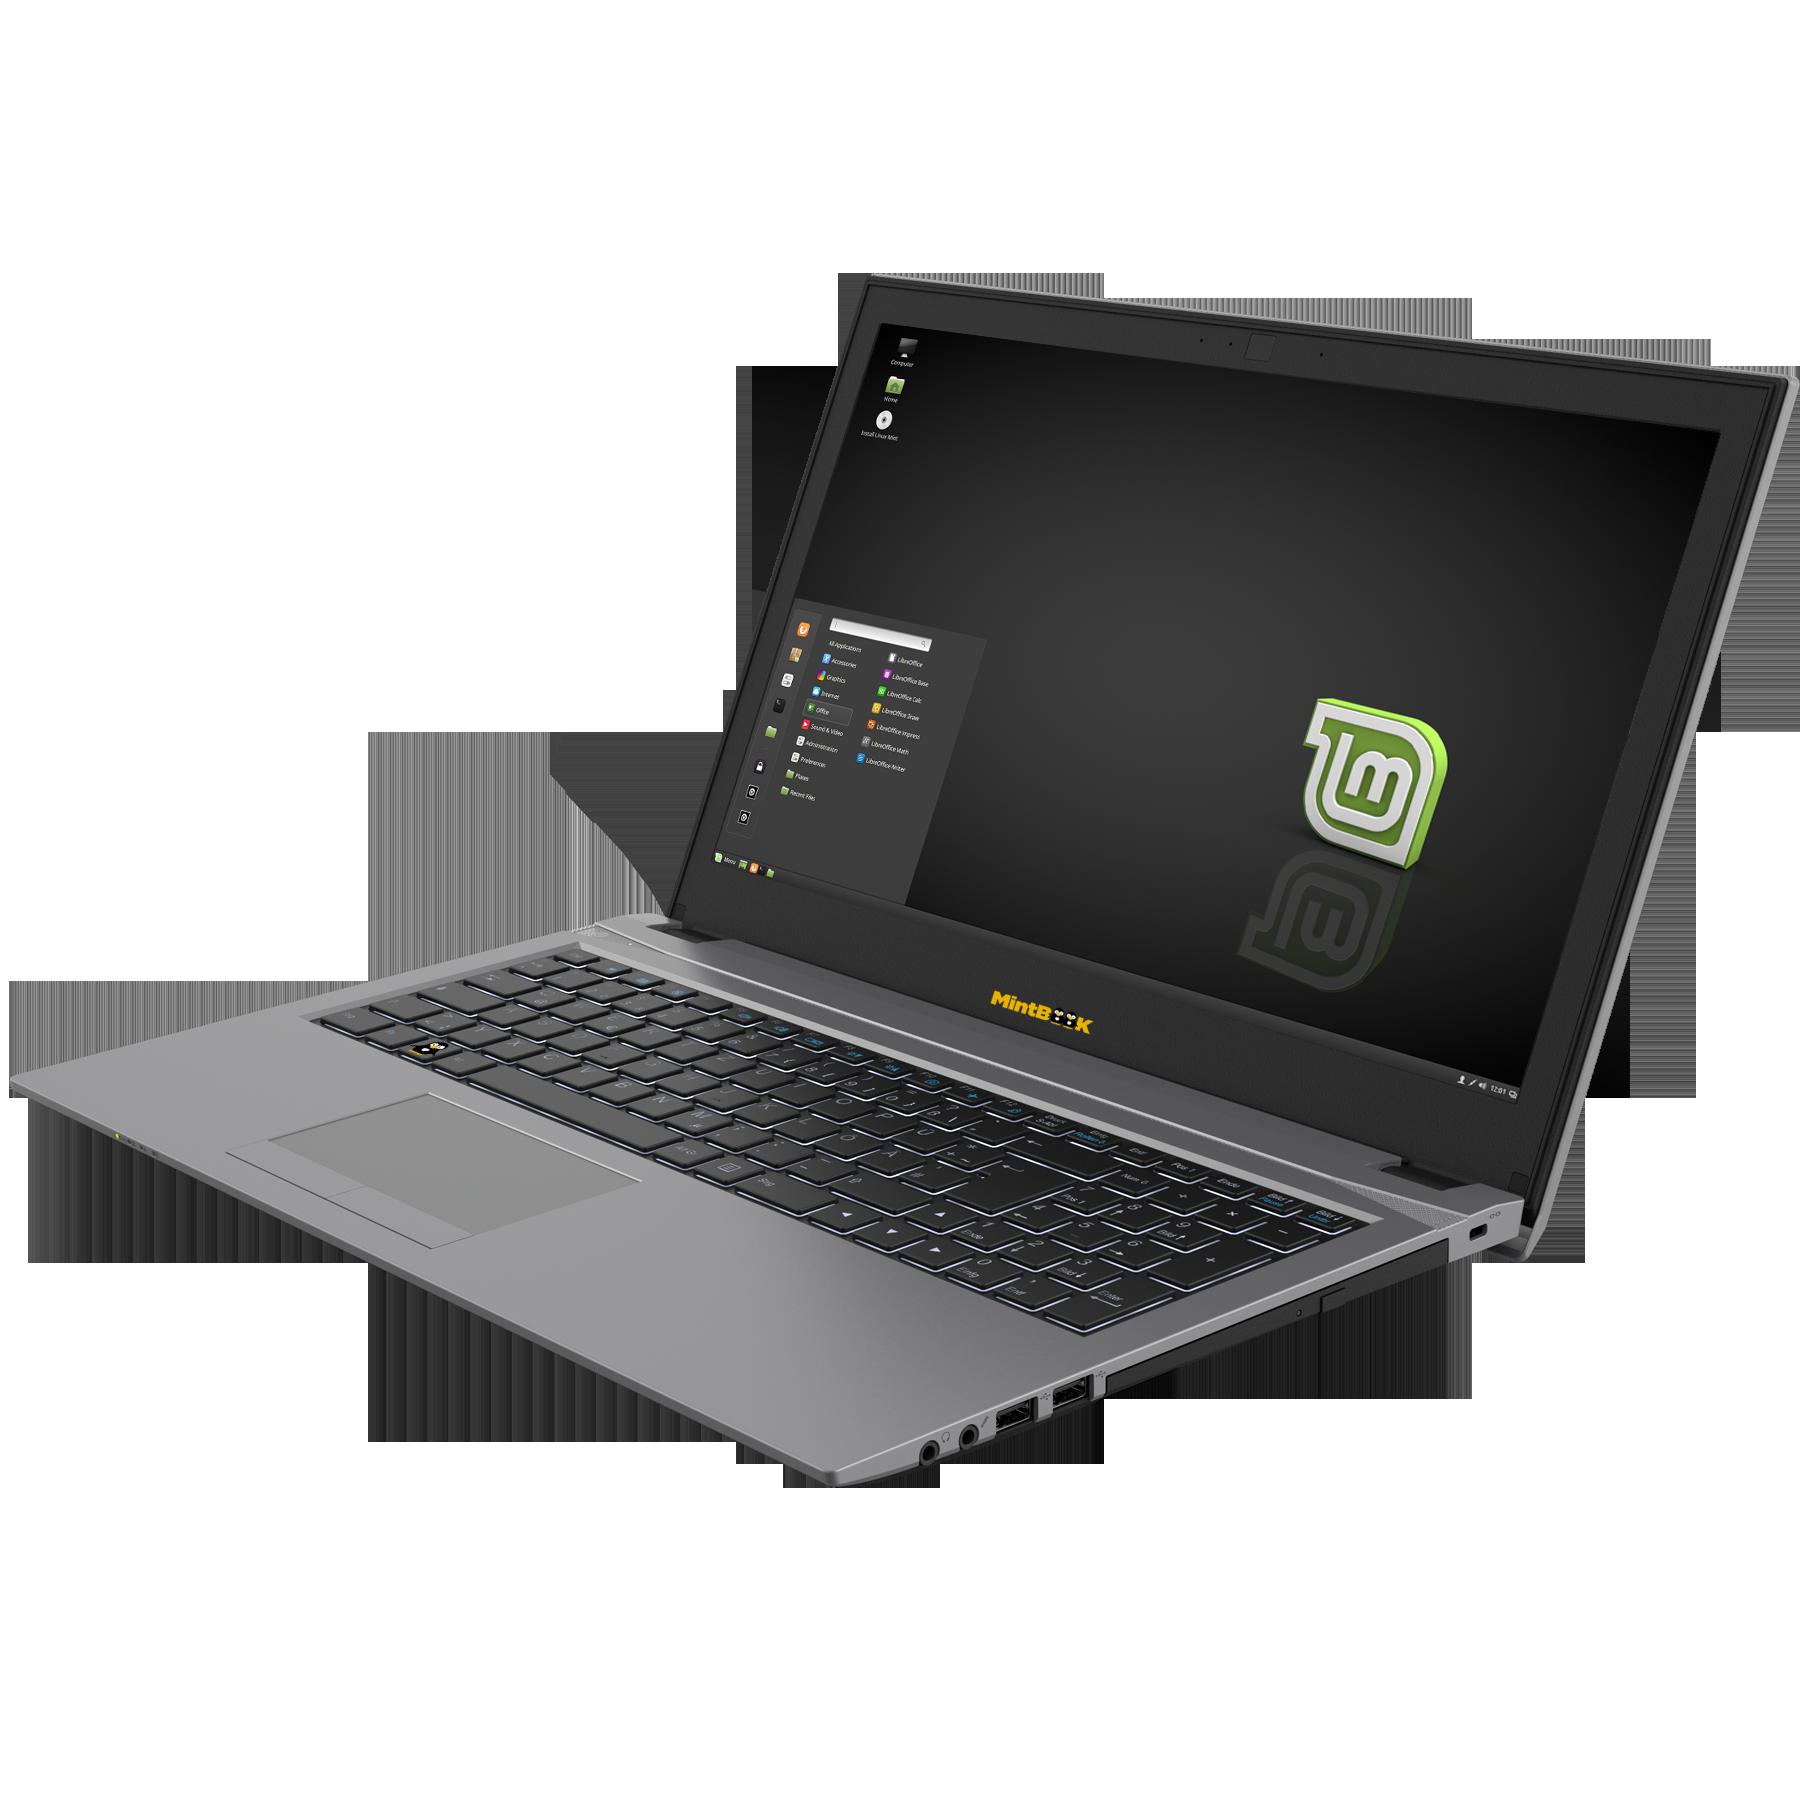 Linux-Mint NoteBook 15,6